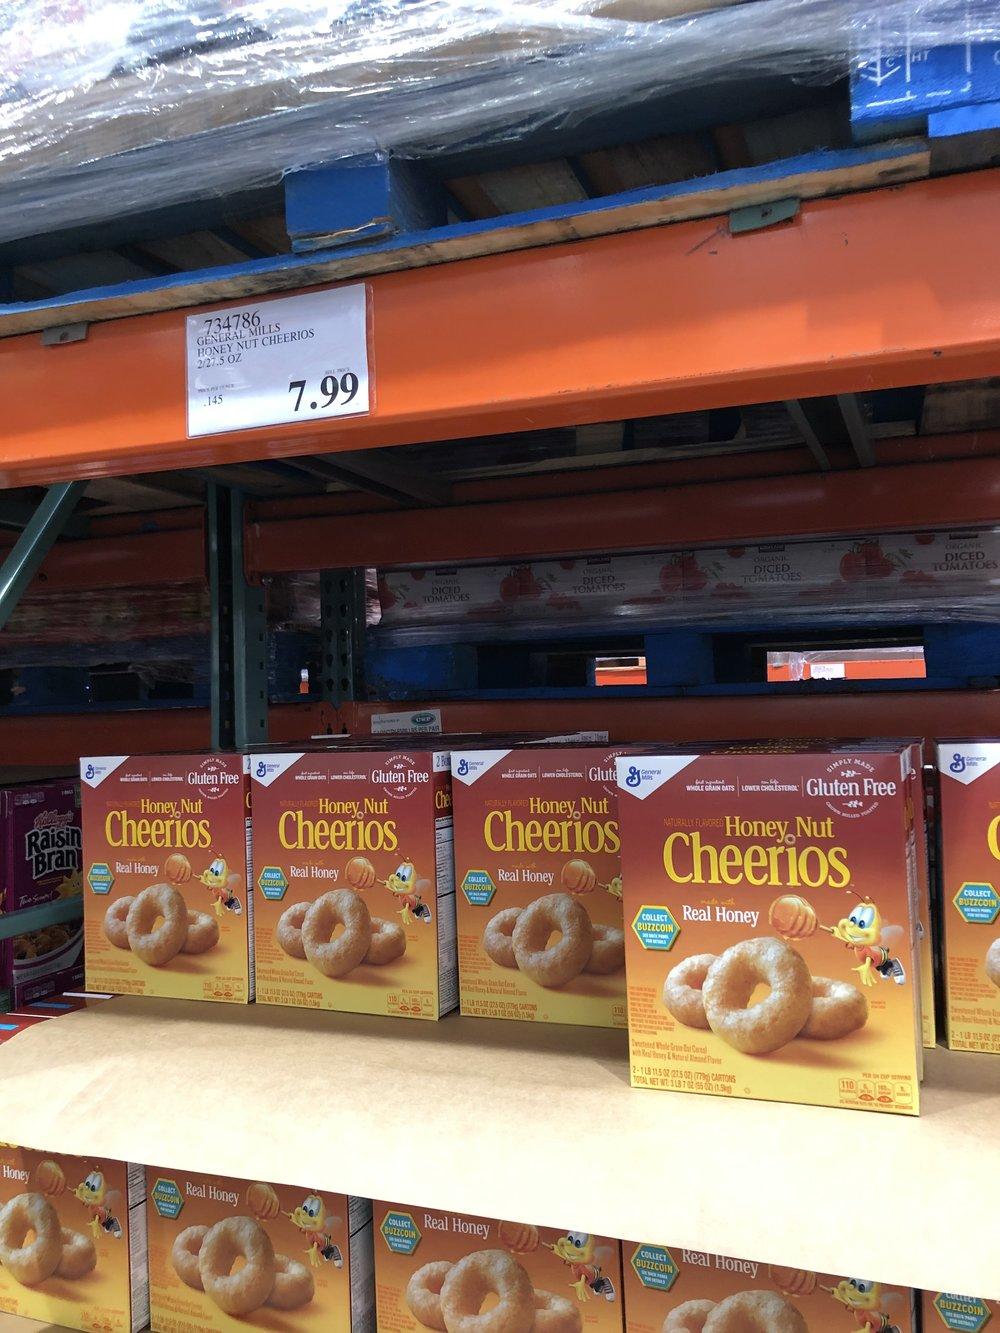 Costco Cheerios.jpg